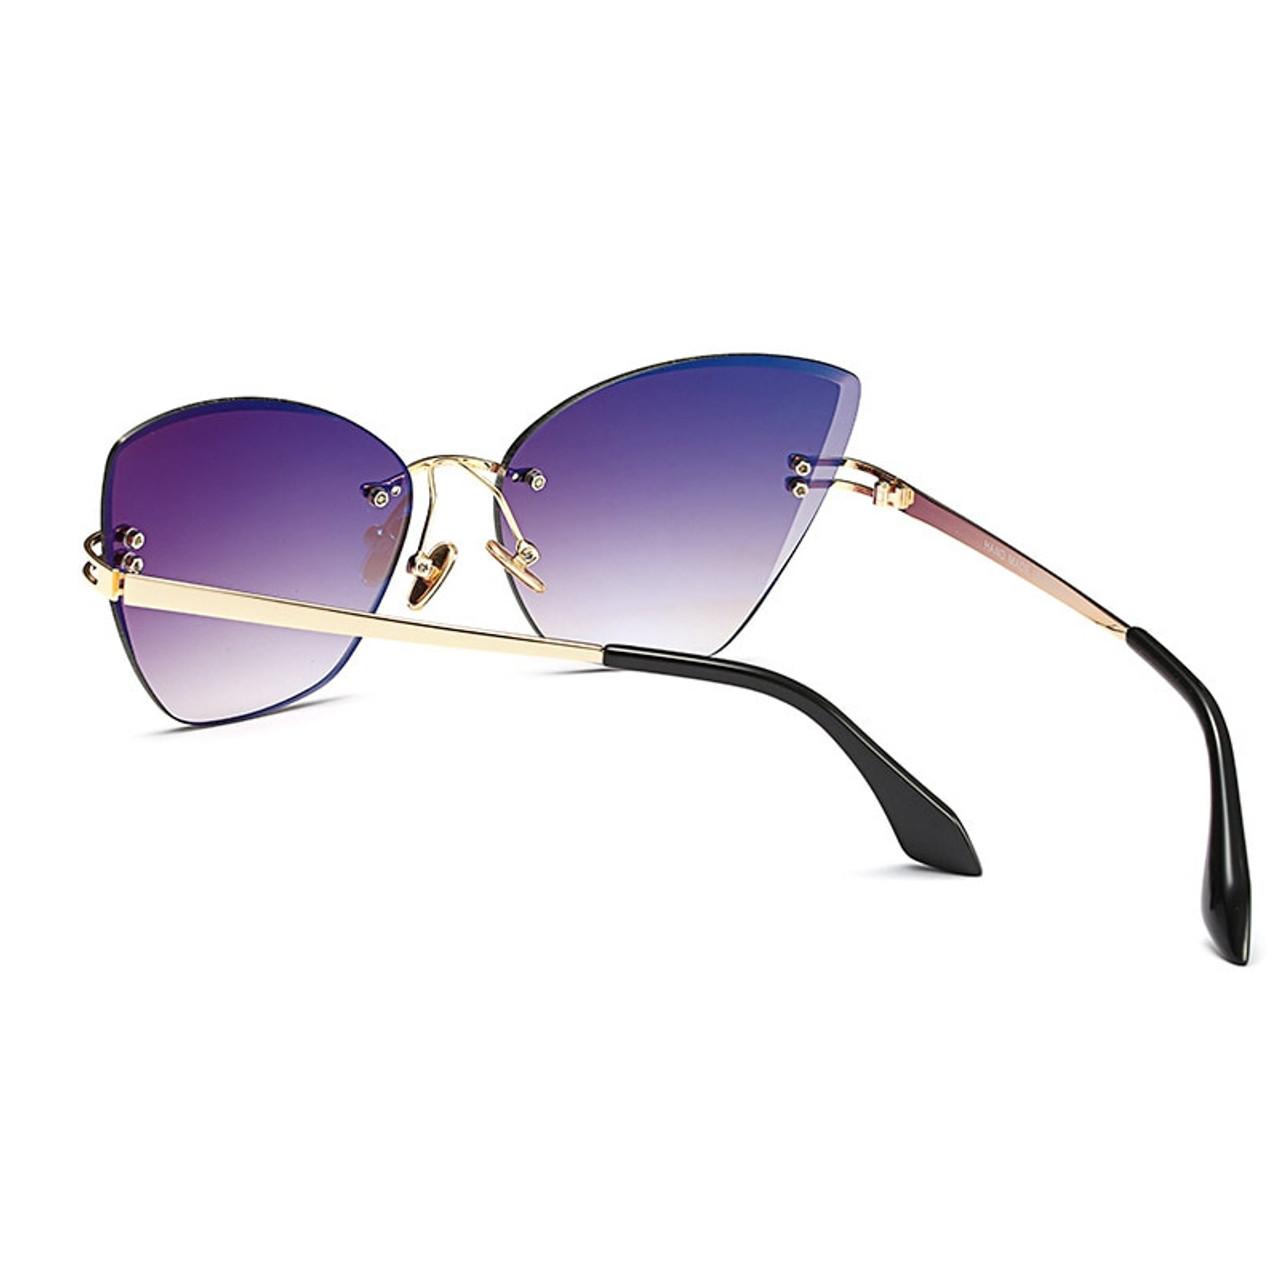 5296a8339 ... RSSELDN Fashion Rimless Cat Eye Sunglasses Women Brand Designer Clear  Lens Gradient Sun Glasses Female UV400 ...